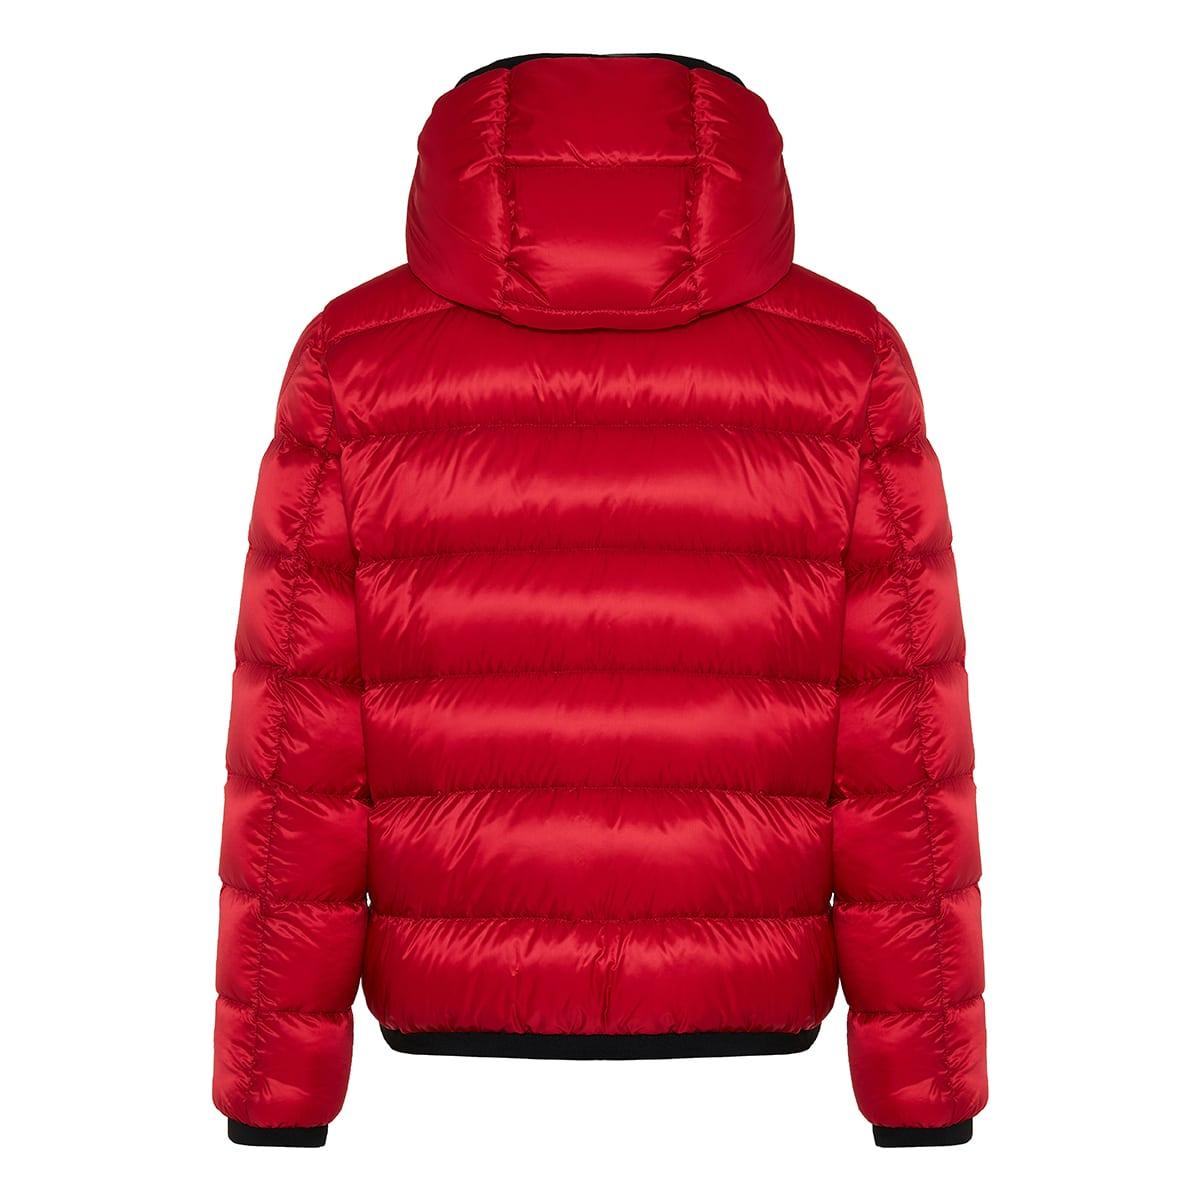 Myosotis quilted puffer jacket